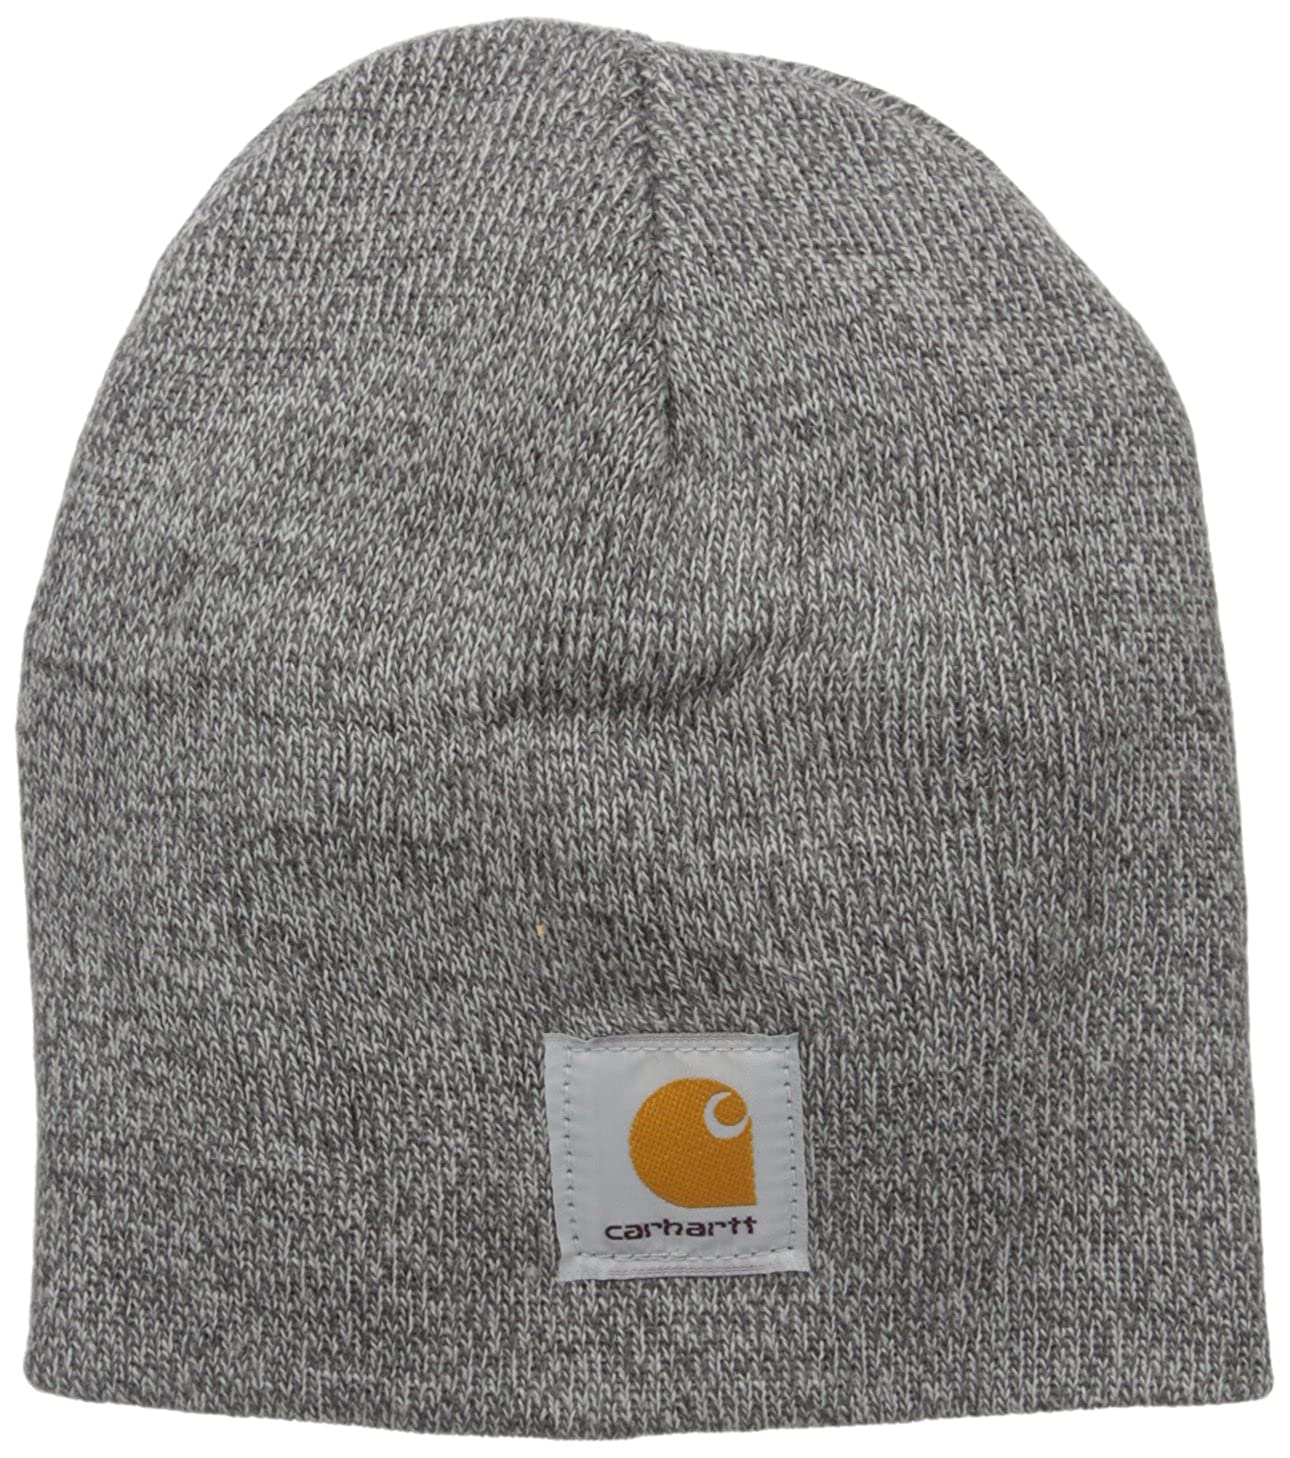 a53086d00f9 Carhartt Men s Acrylic Knit Hat at Amazon Men s Clothing store